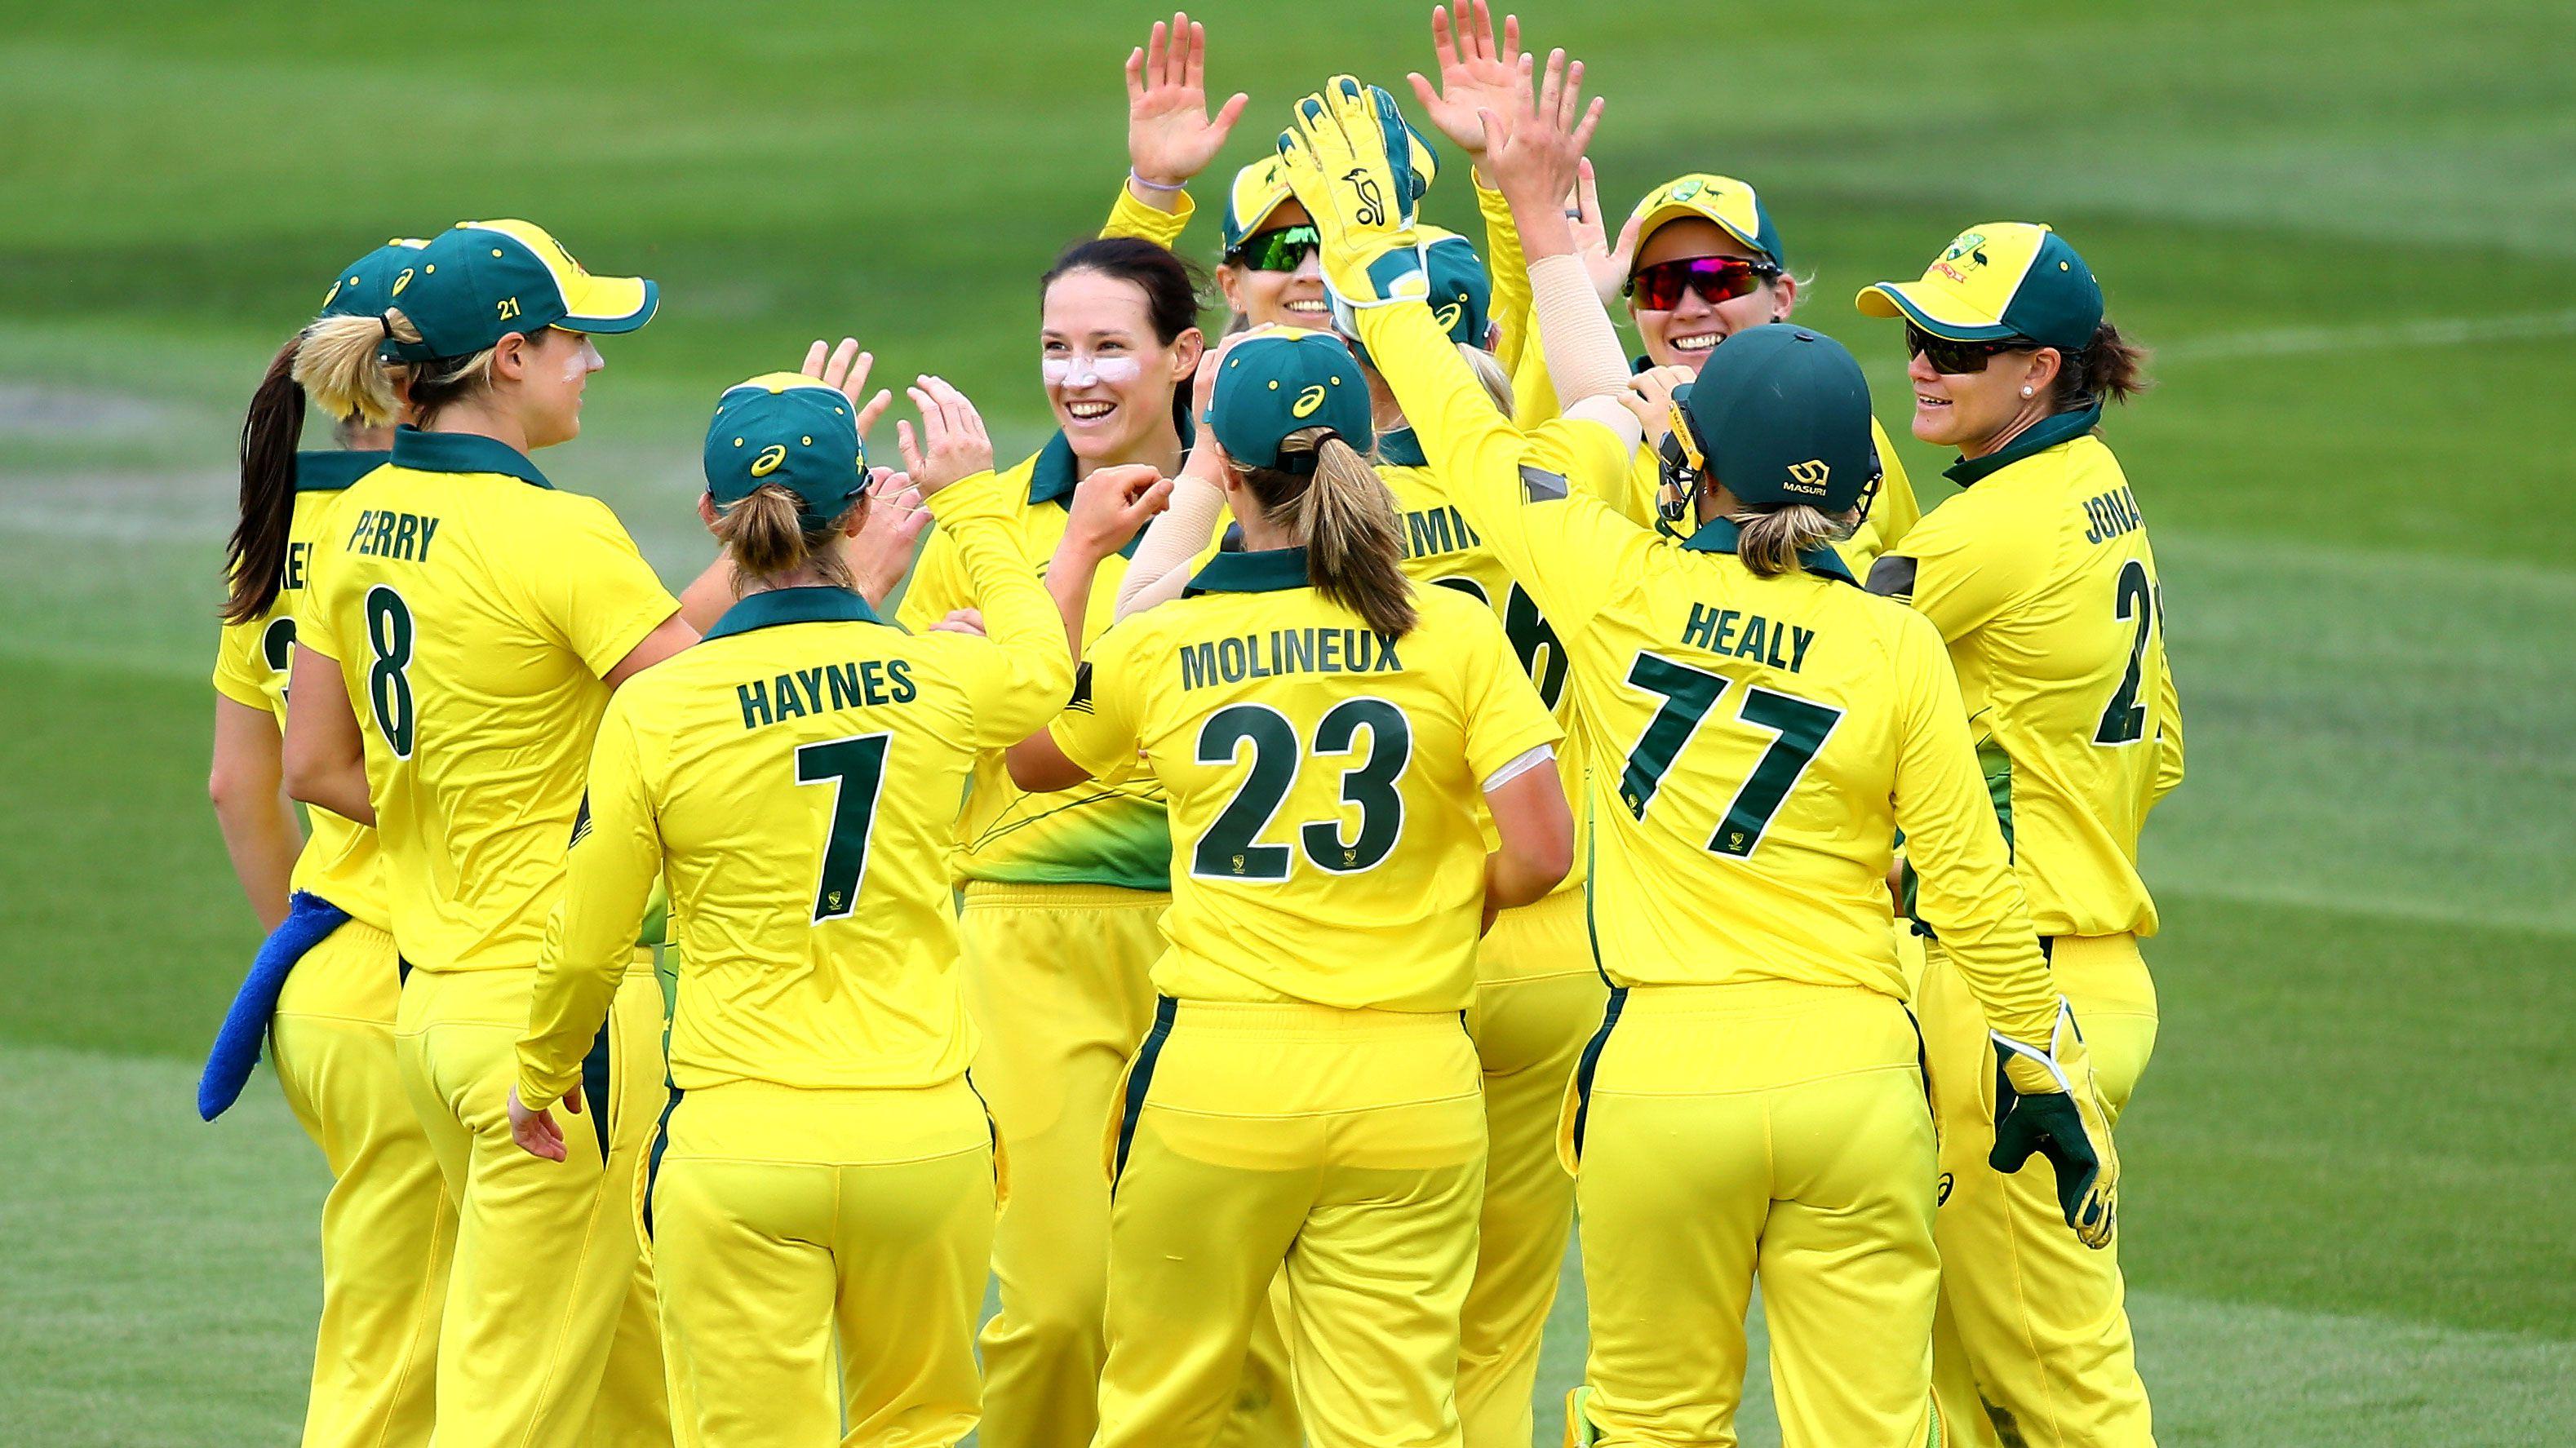 Megan Schutt hat-trick sets up Australia's ODI clean sweep over West Indies